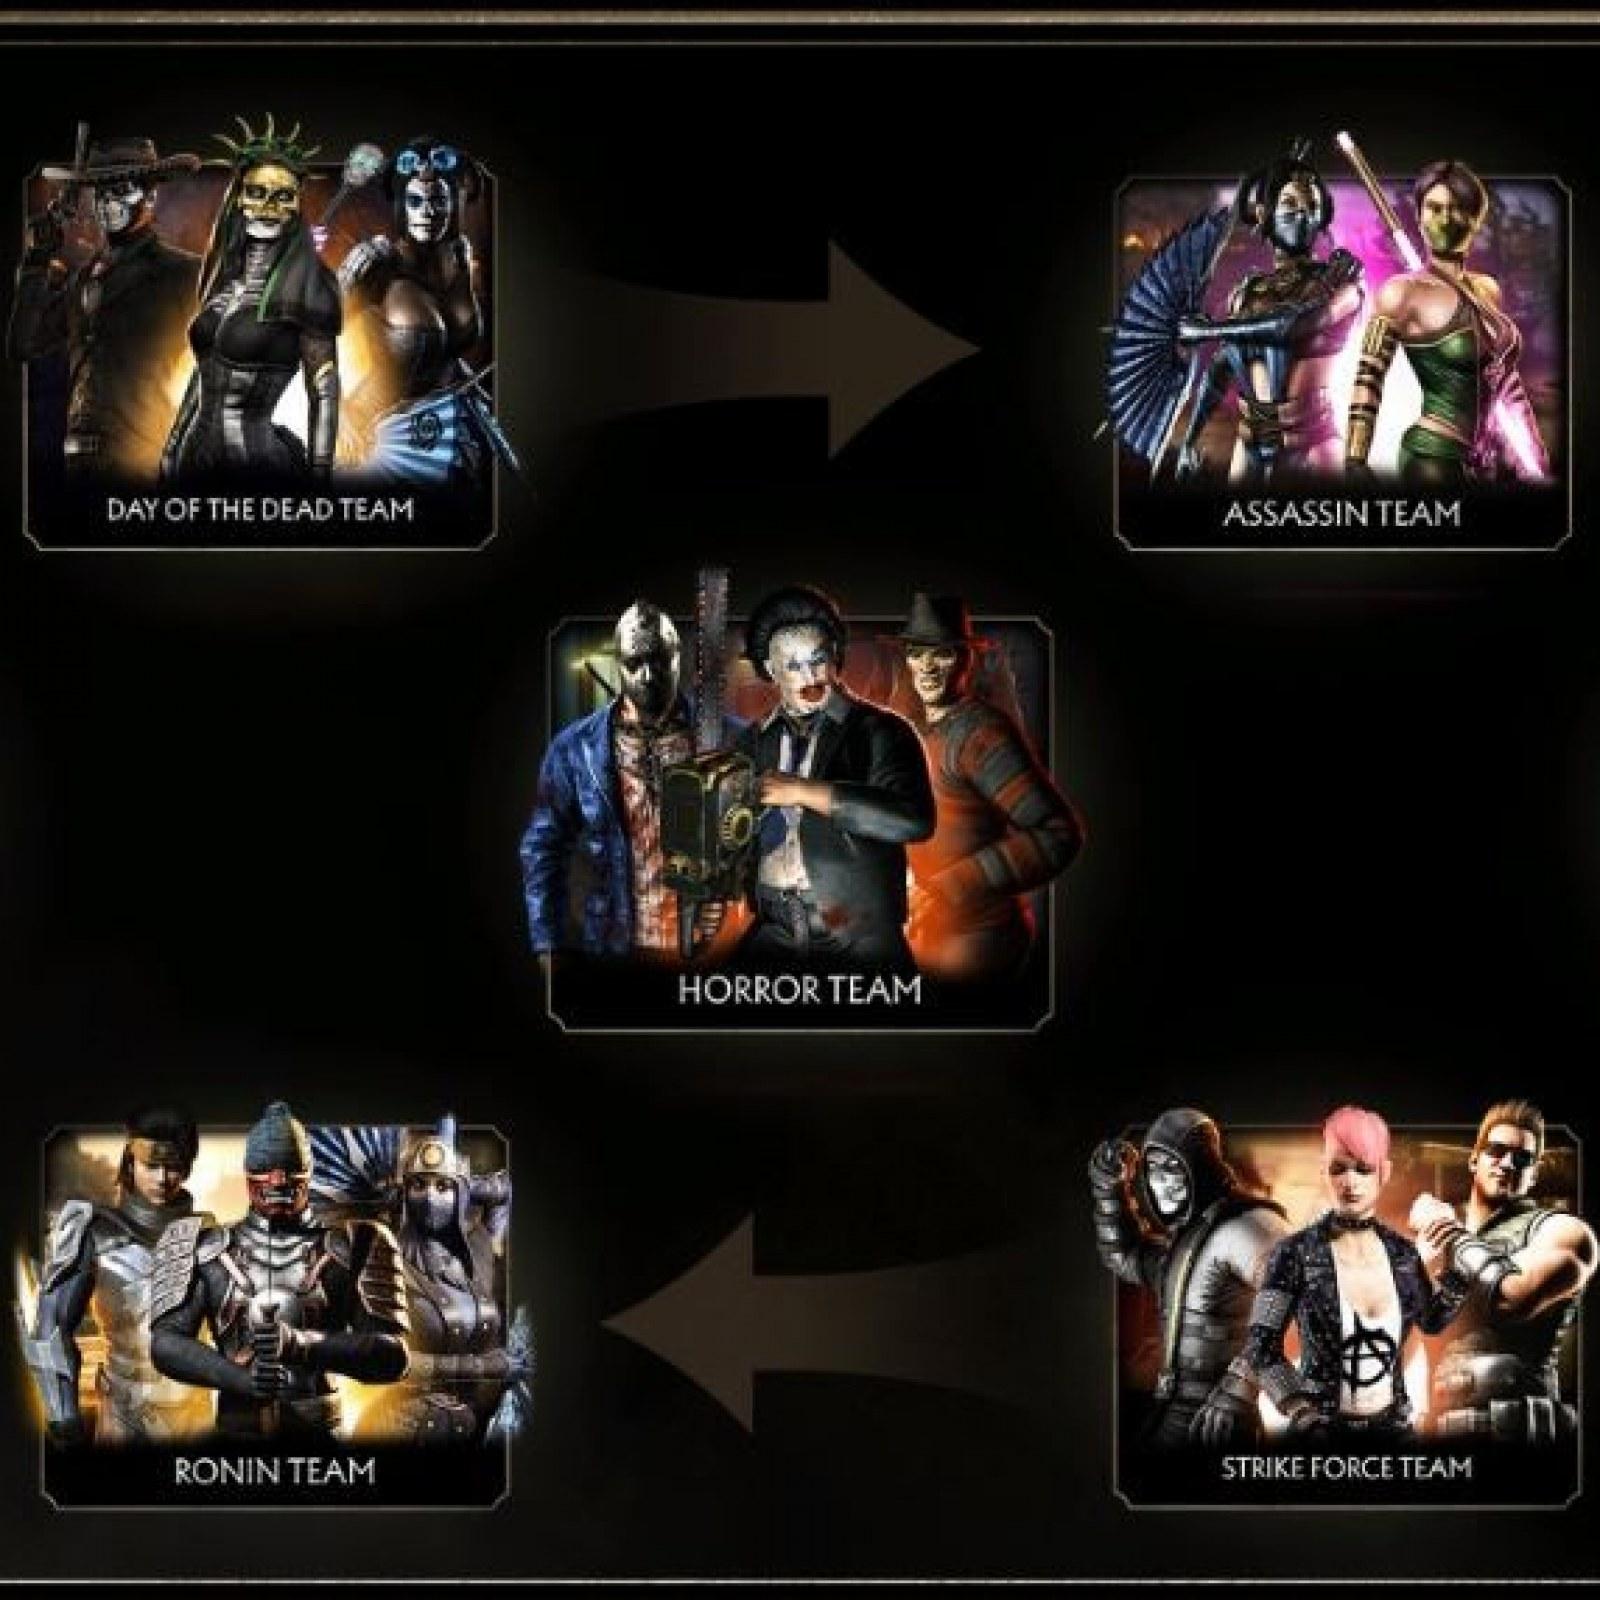 Mortal Kombat Mobile' 2 0 Update Coming Next Week, Will